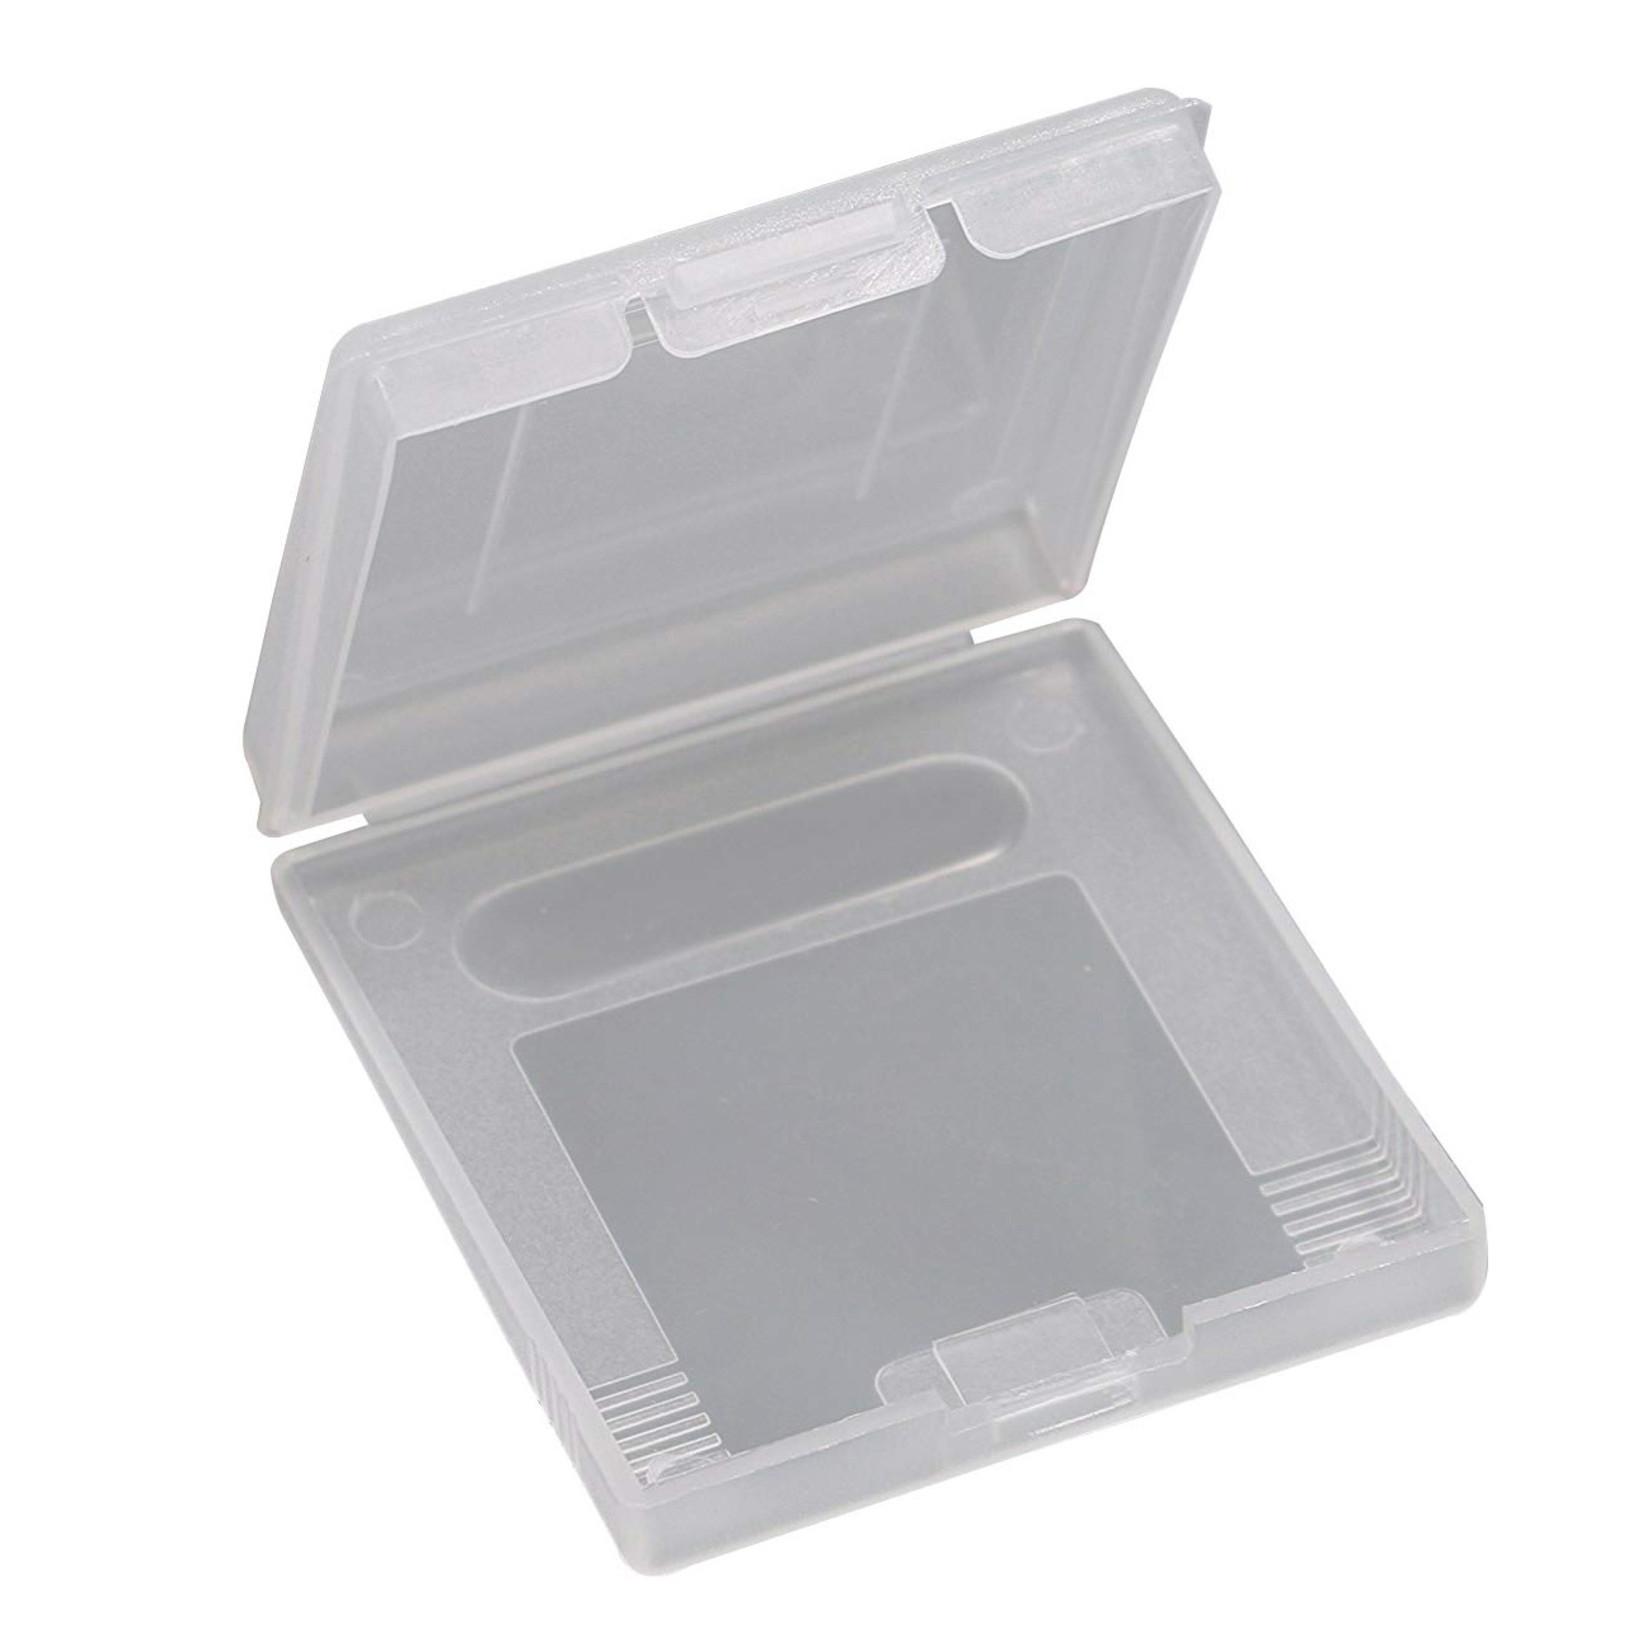 5x Orginele Nintendo Game Boy Cartridge Case